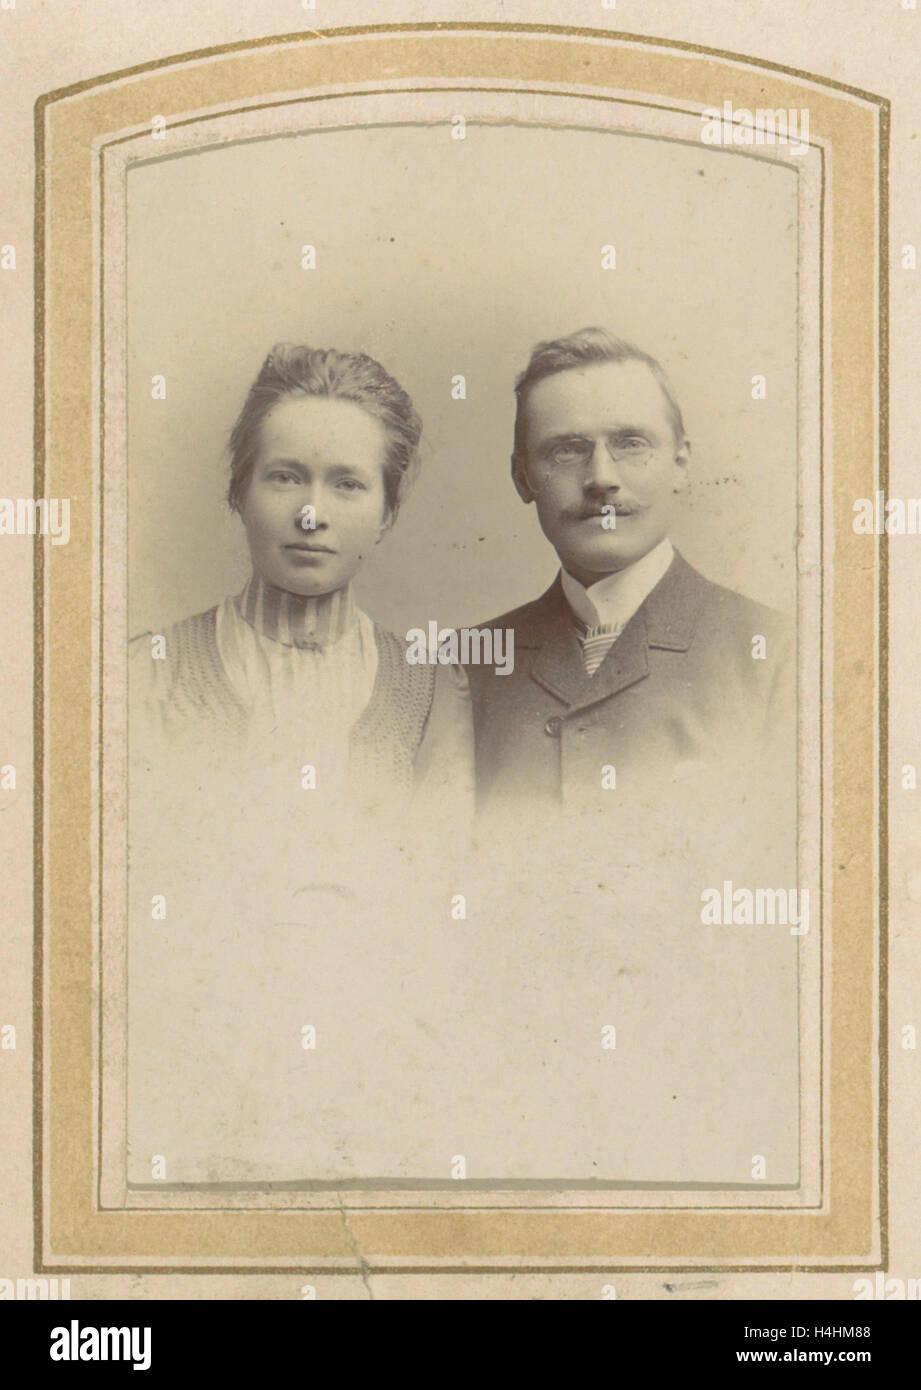 Portrait of a woman and a man with a pince-nez, M. Buttinghausen c. 1873 - c. 1895, M. Büttinghausen, c. 1873 - Stock Photo